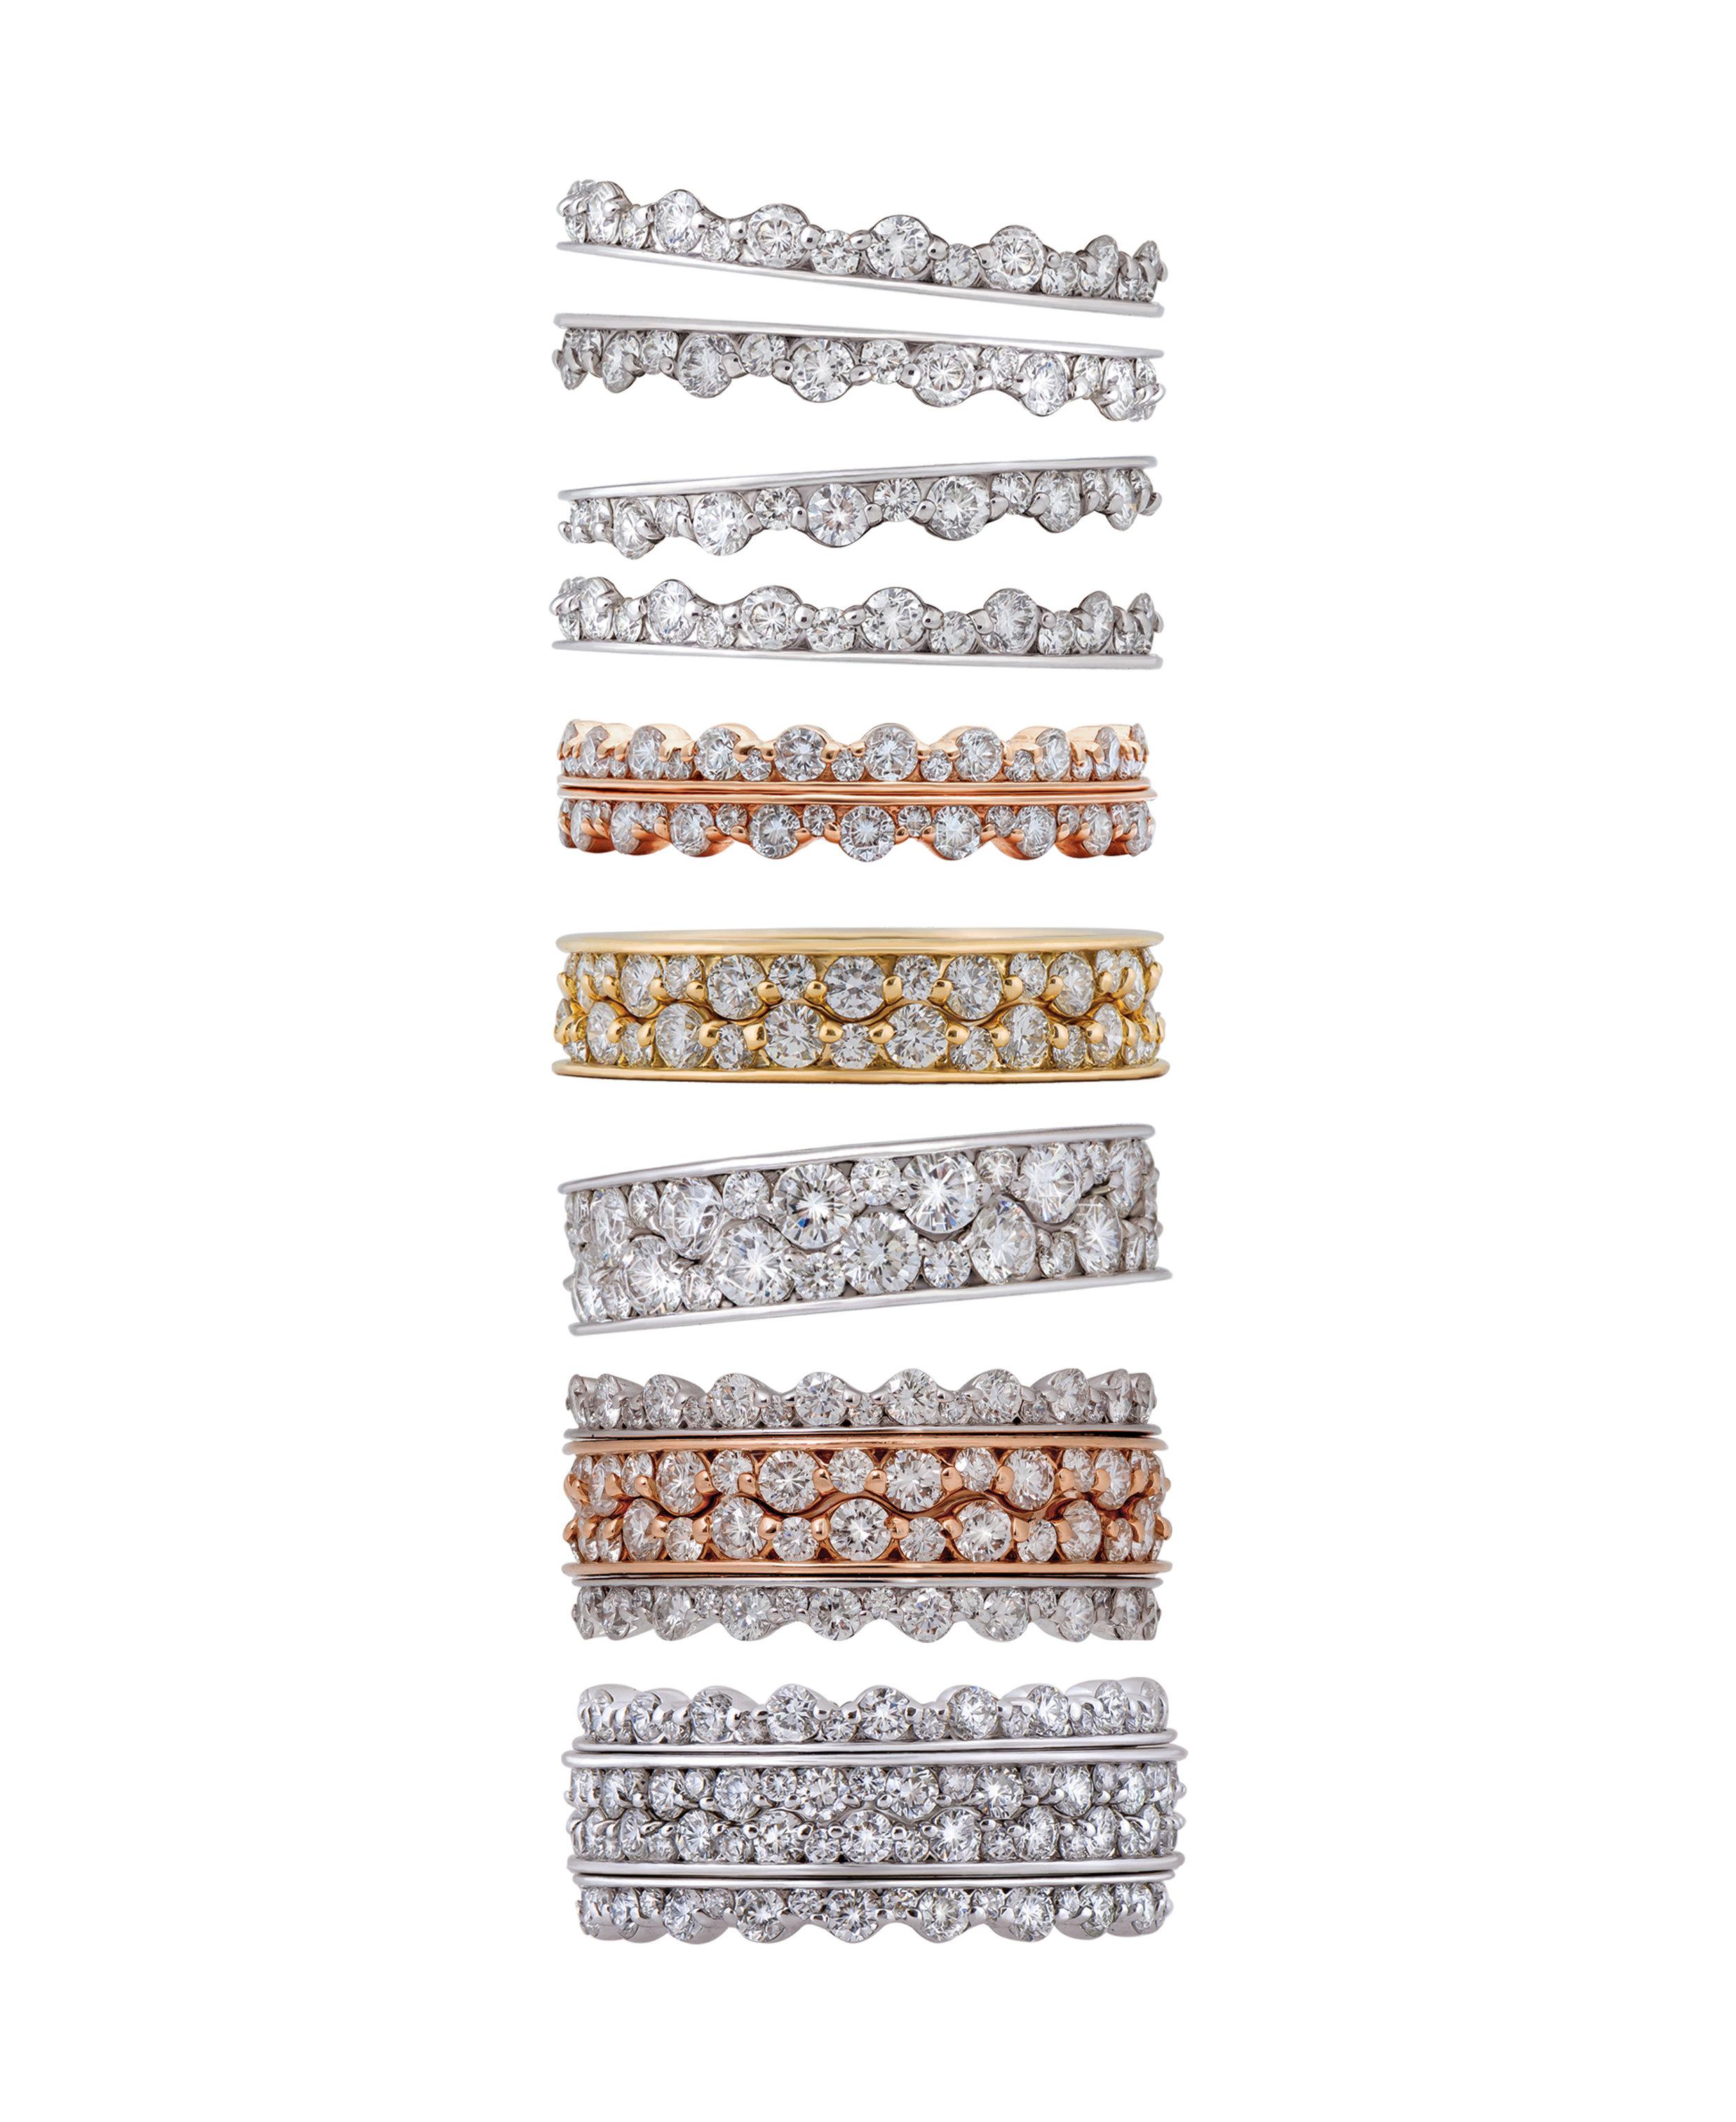 designer diamond bridal jewelry-72651.jpg